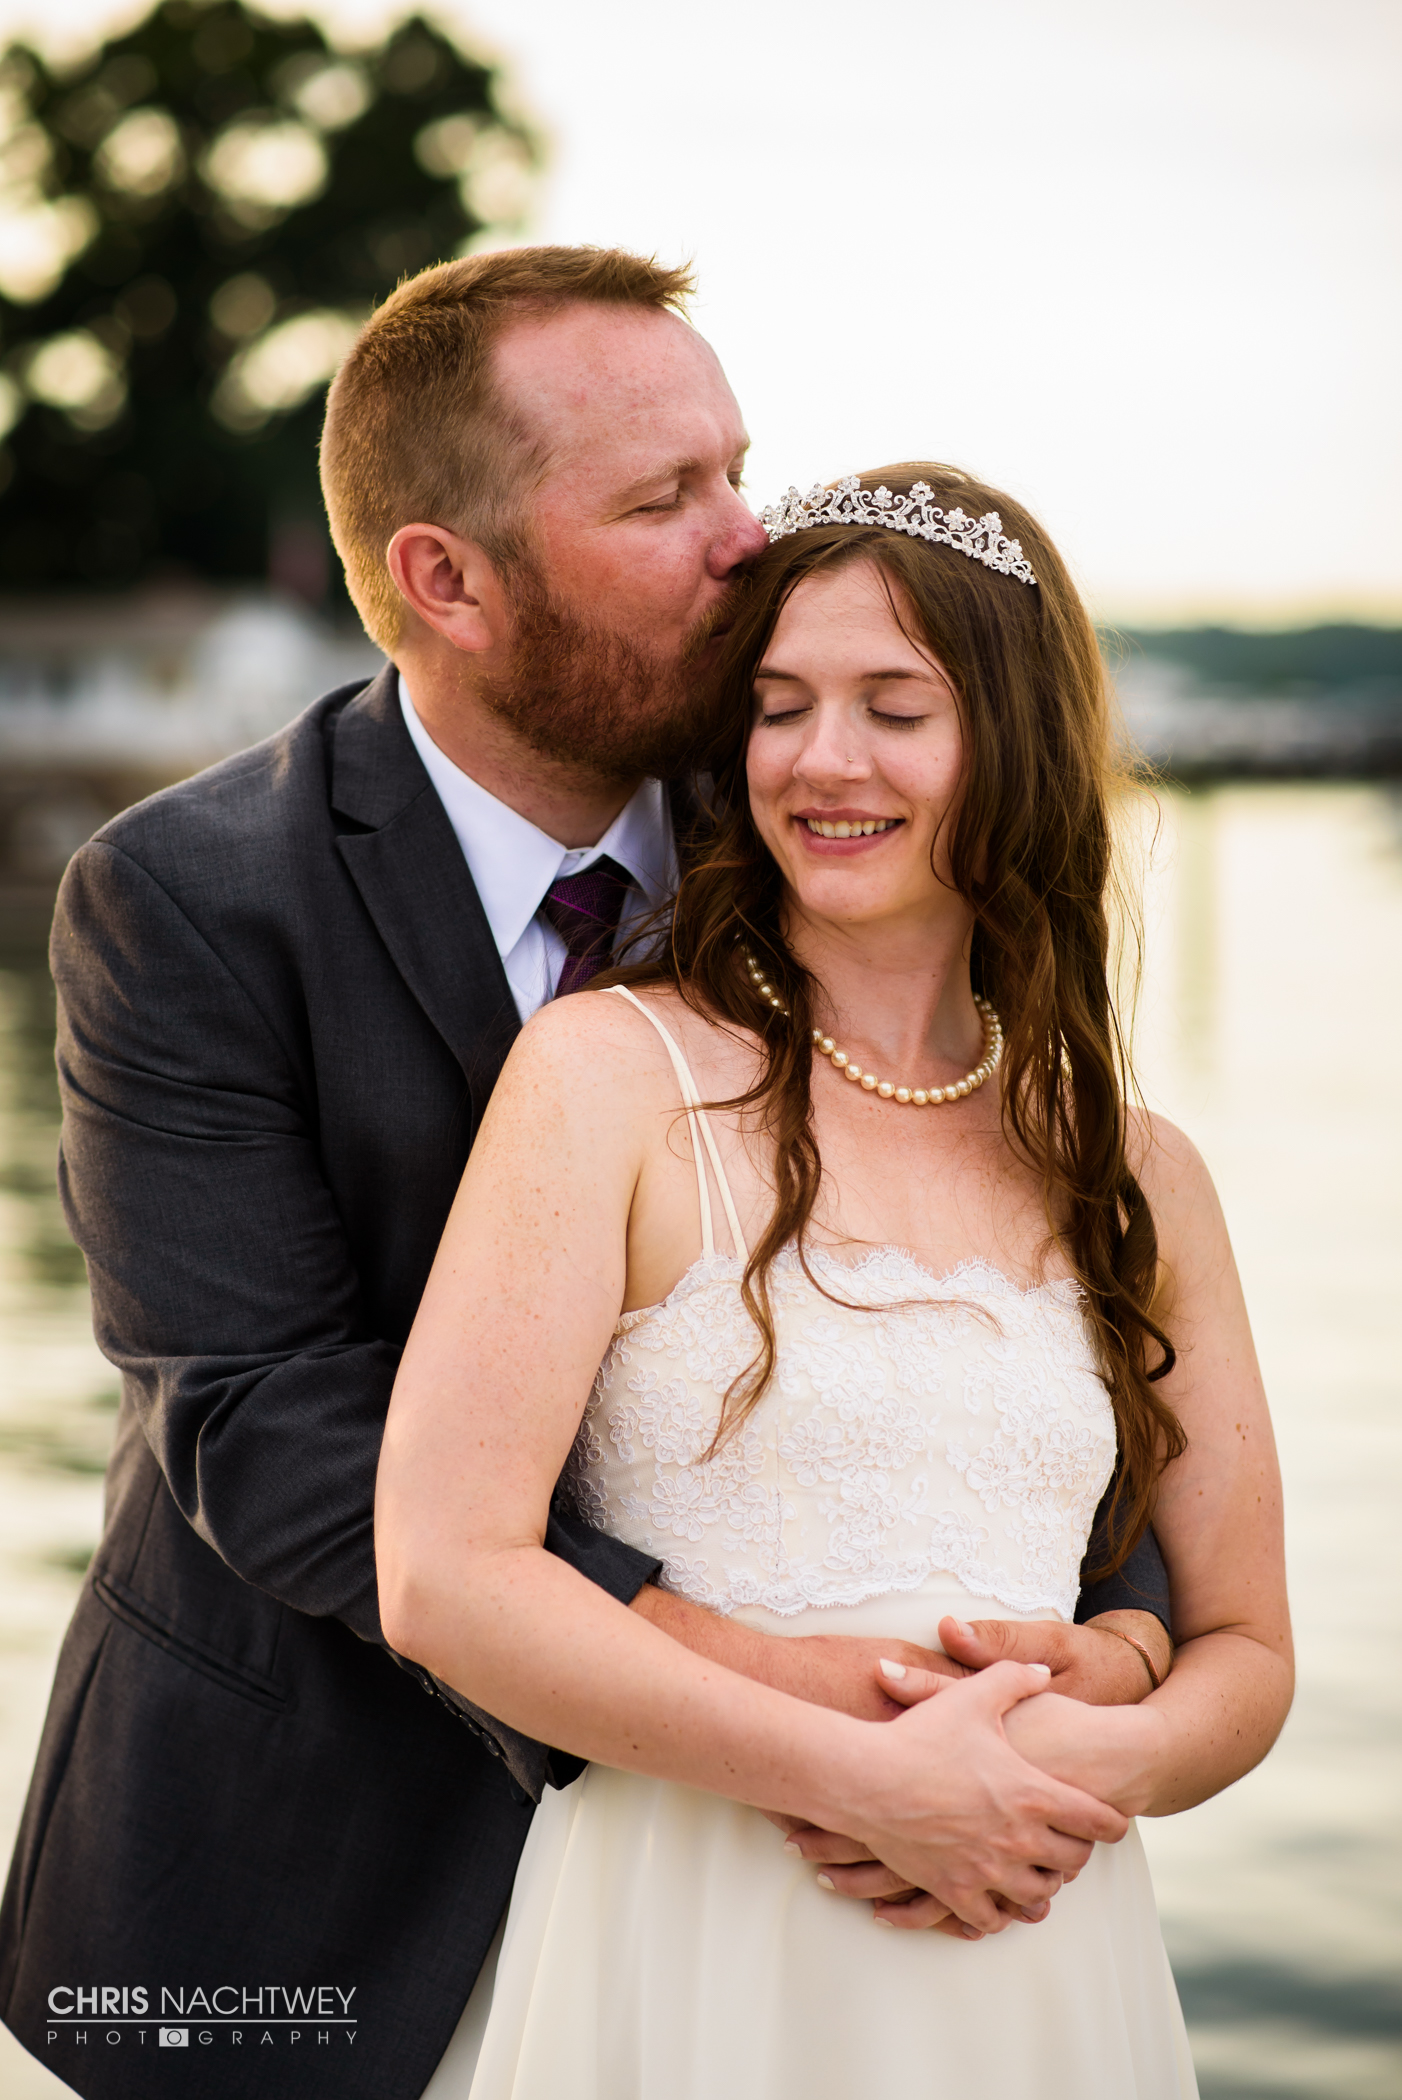 wedding-photographers-in-mystic-ct-chris-nachtwey-2016.jpg